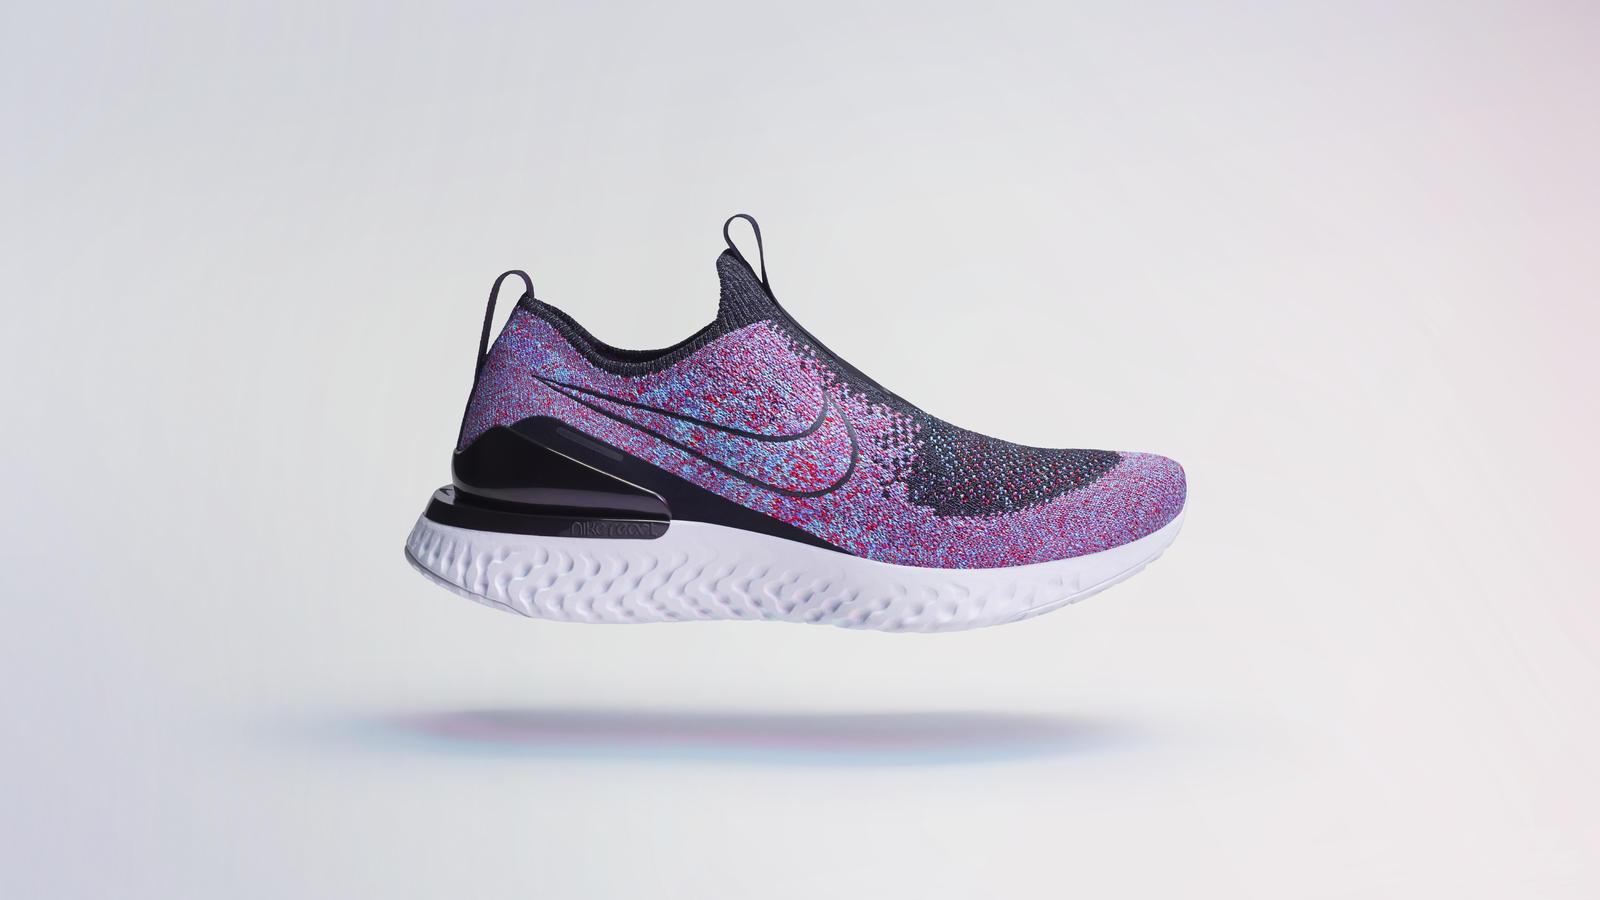 Nike Phantom React Flyknit Laceless